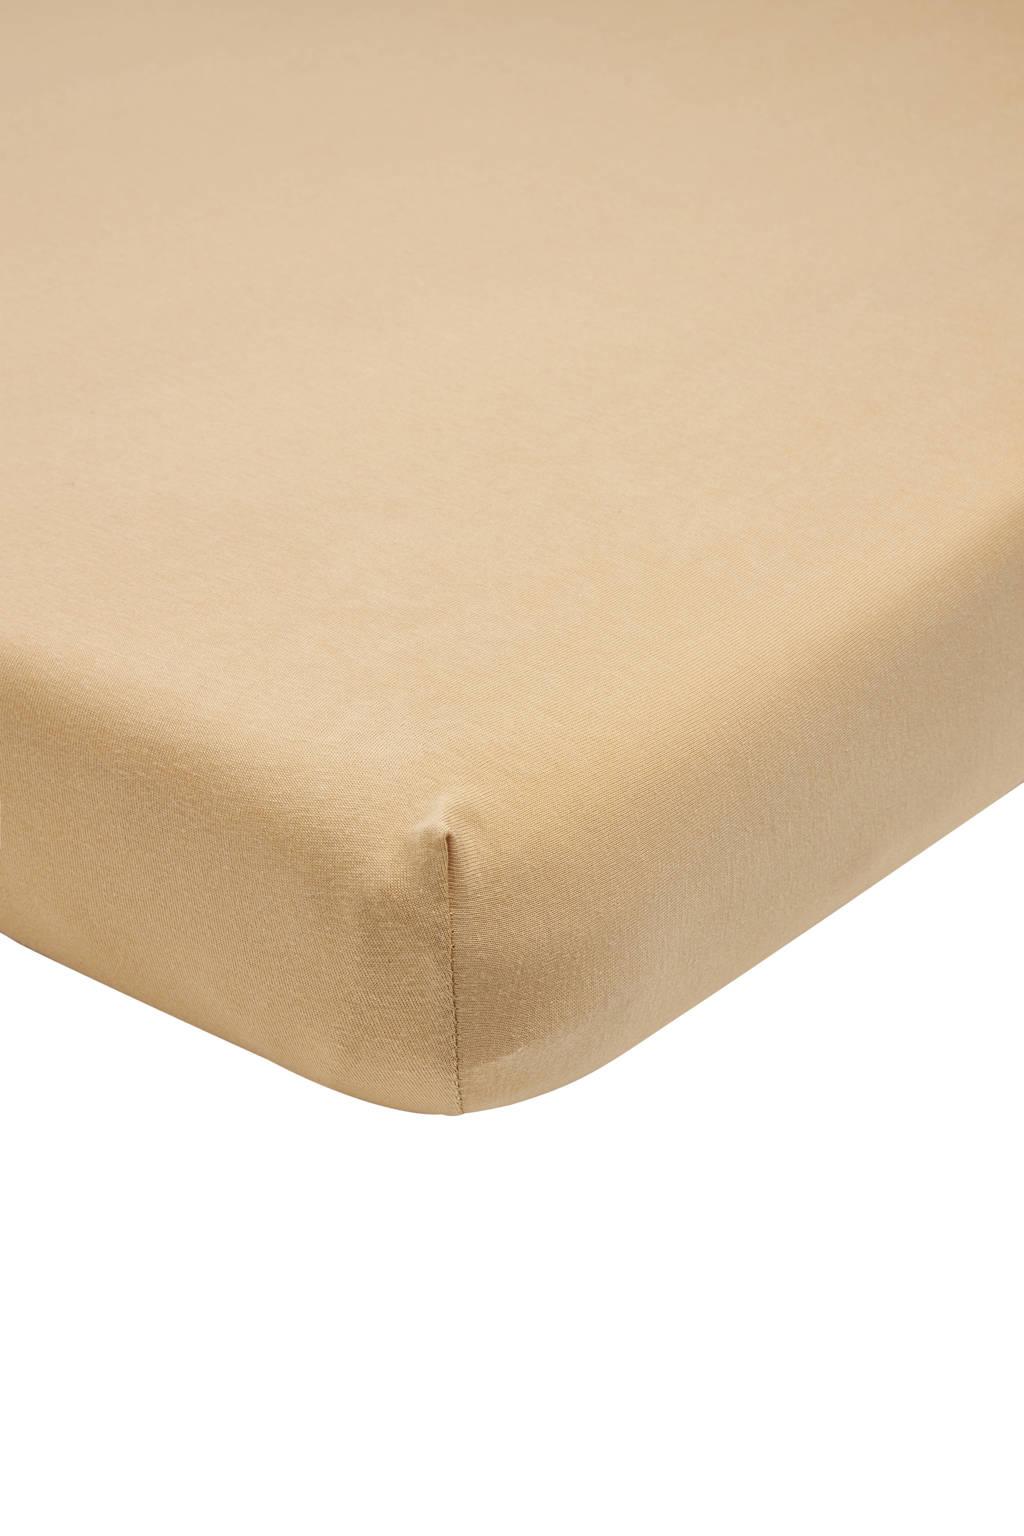 Meyco jersey hoeslaken boxmatras 75x95 cm warm sand, Zand